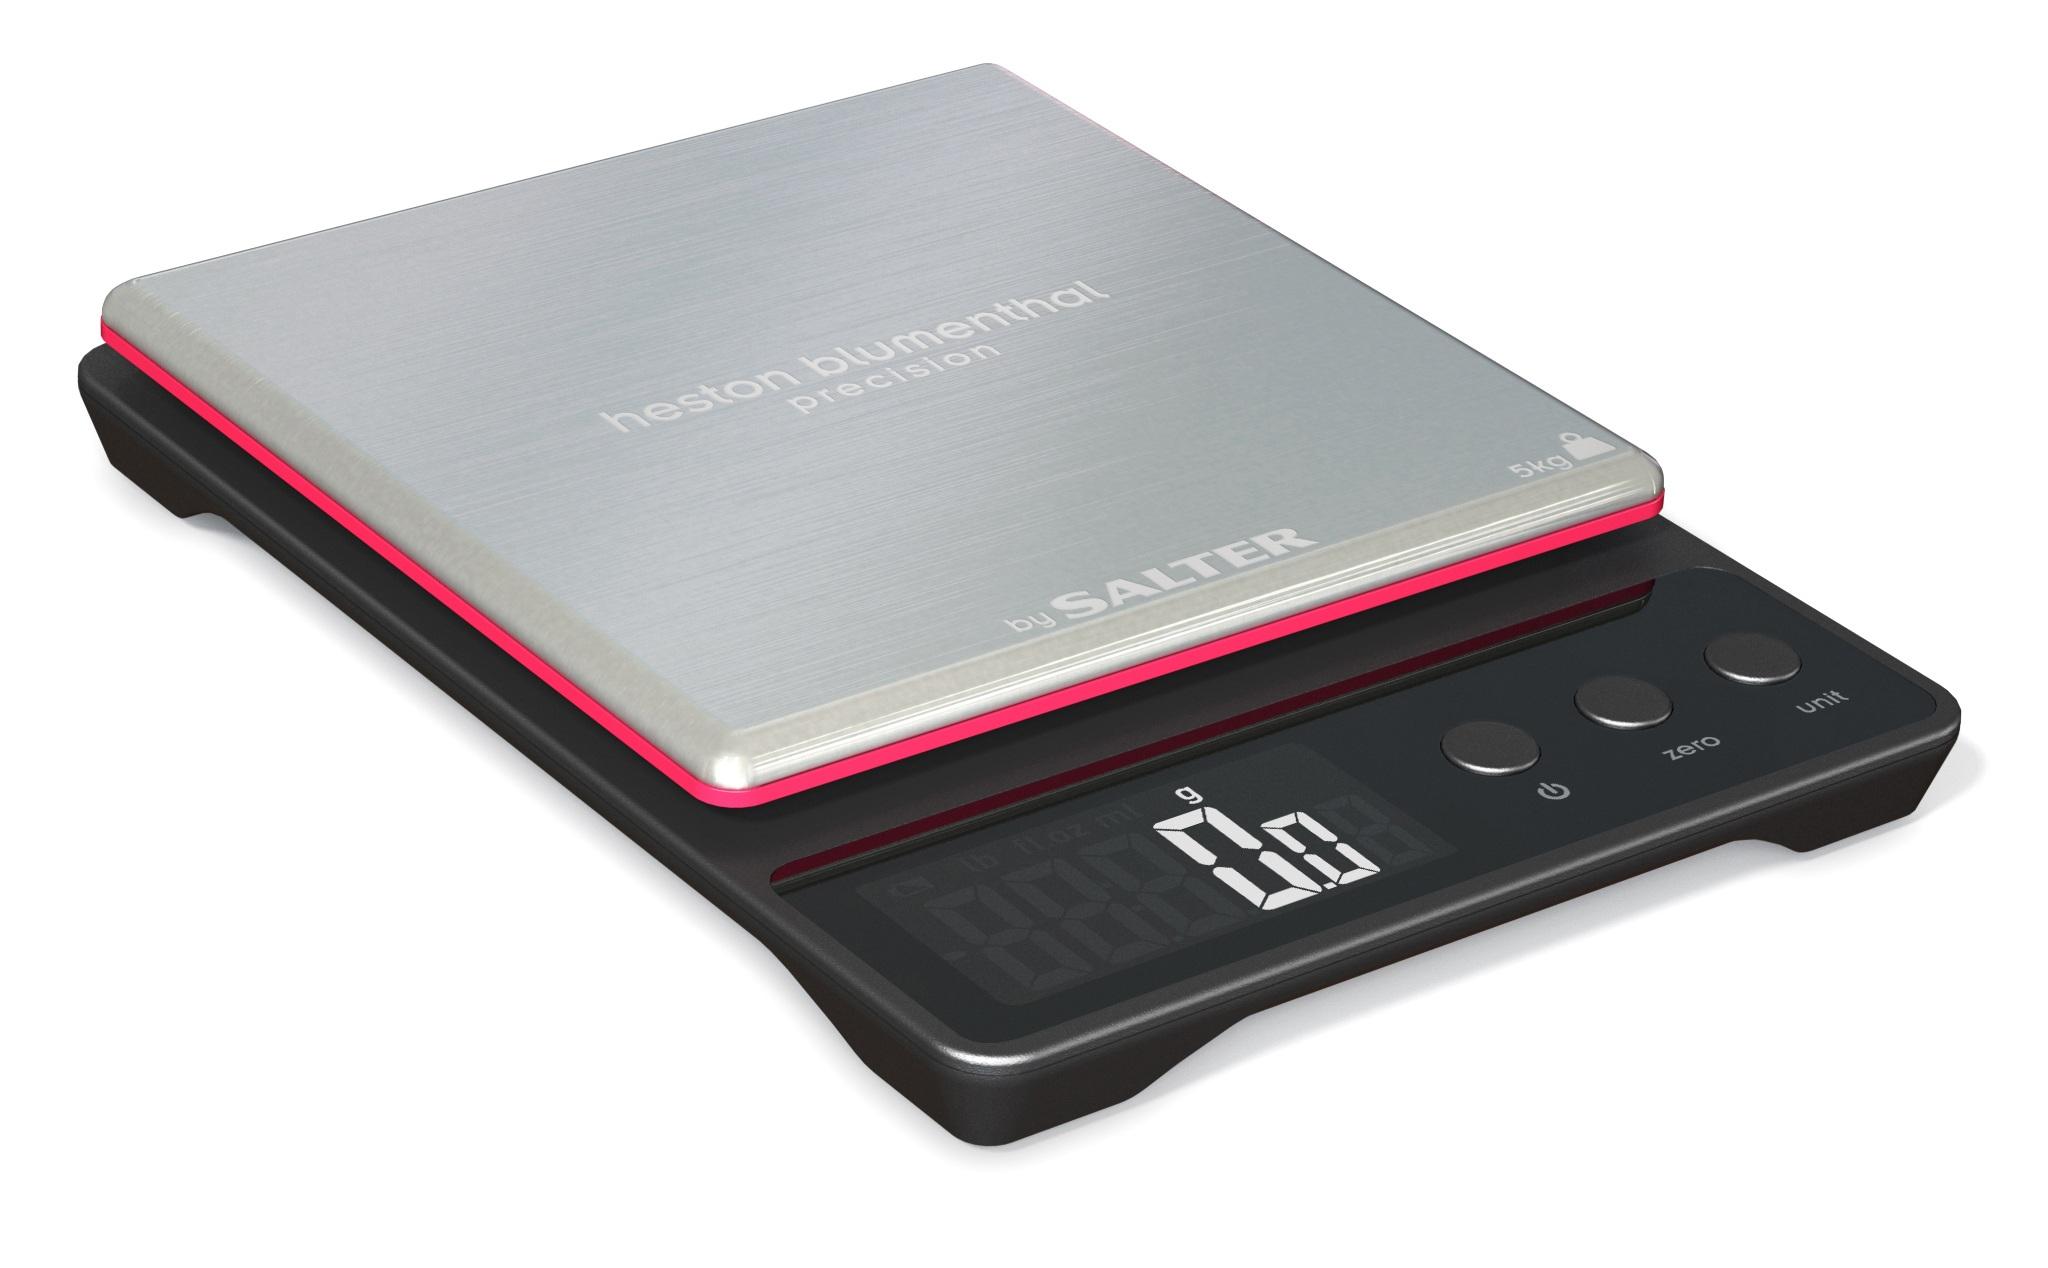 Sentinel Salter 5kg Heston Blumenthal Precision Electronic Digital Kitchen Scales Black